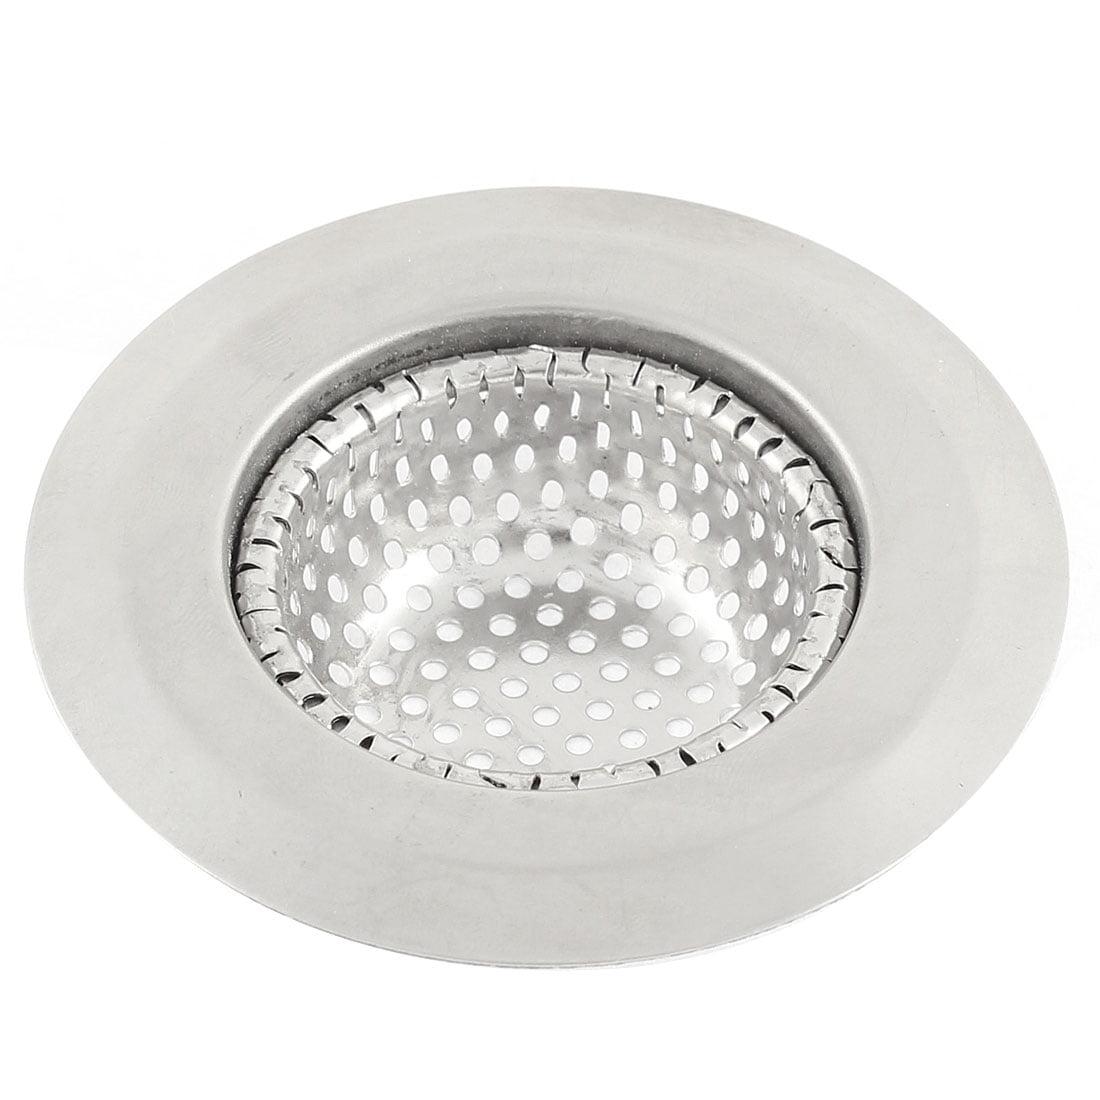 7.3cm Dia Shower Bathtub Basin Mesh Strainer Waste Plug Sink Stopper